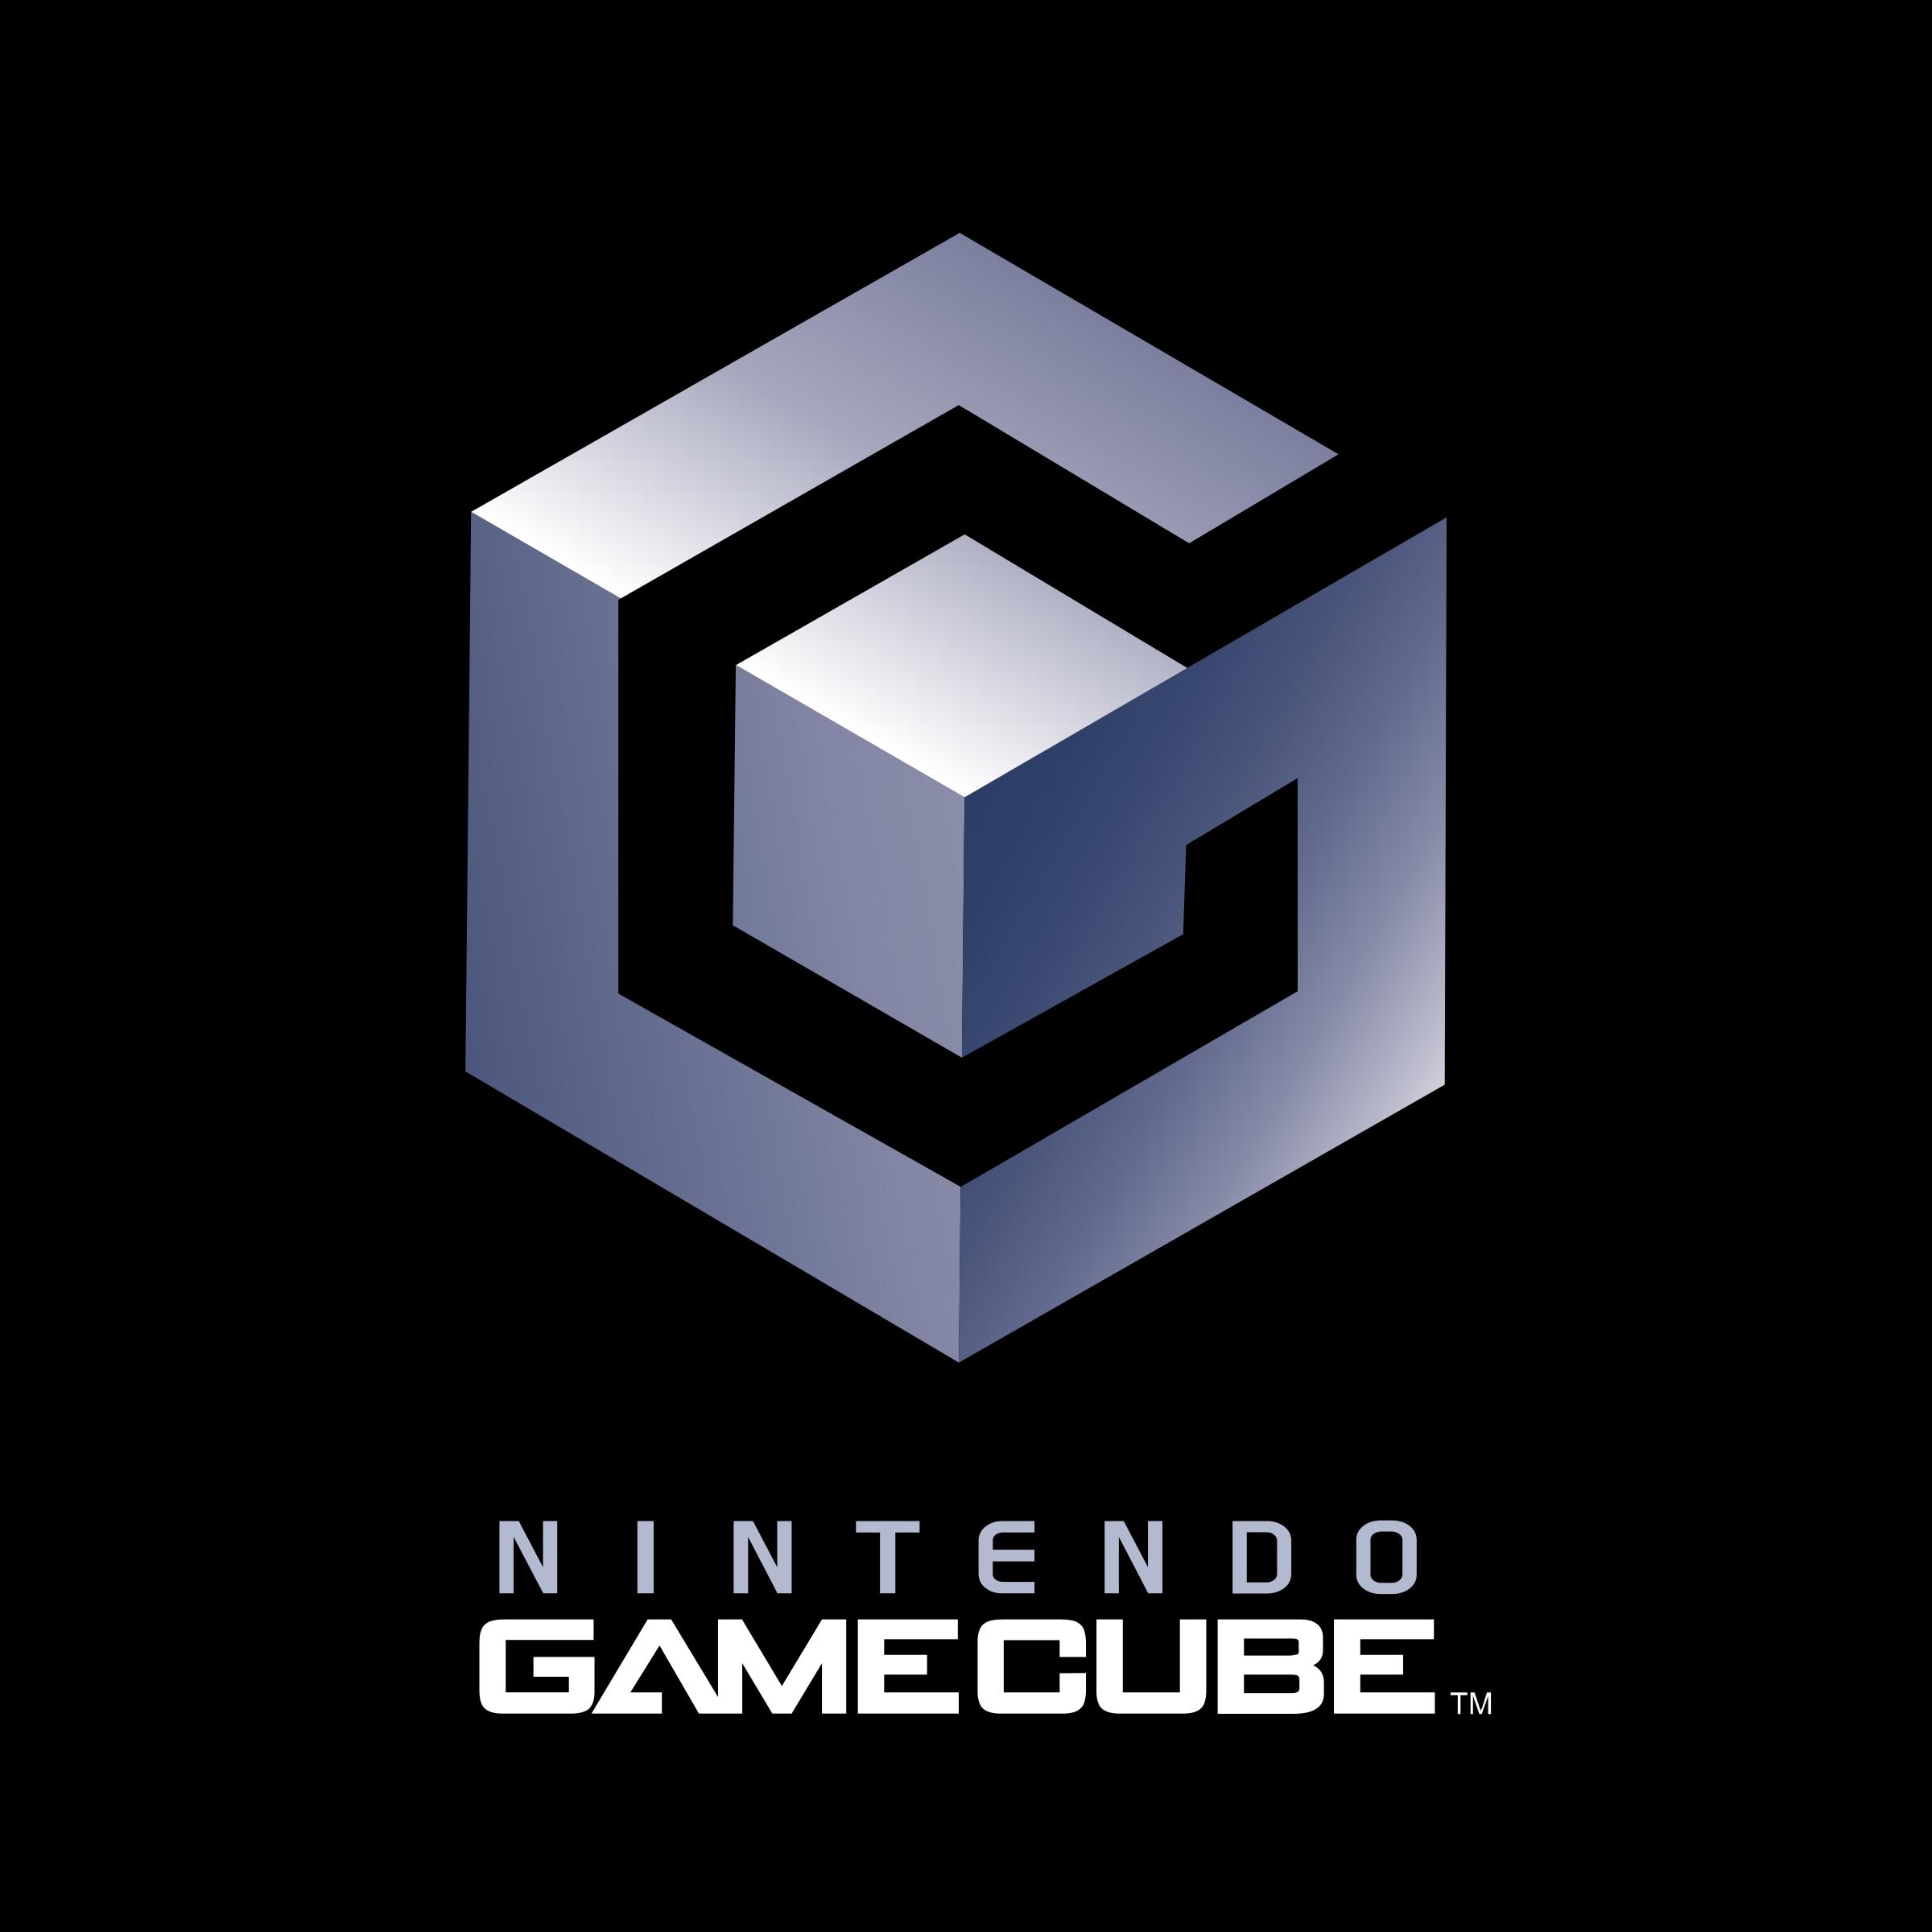 「gamecube logo」的圖片搜尋結果 (With images)